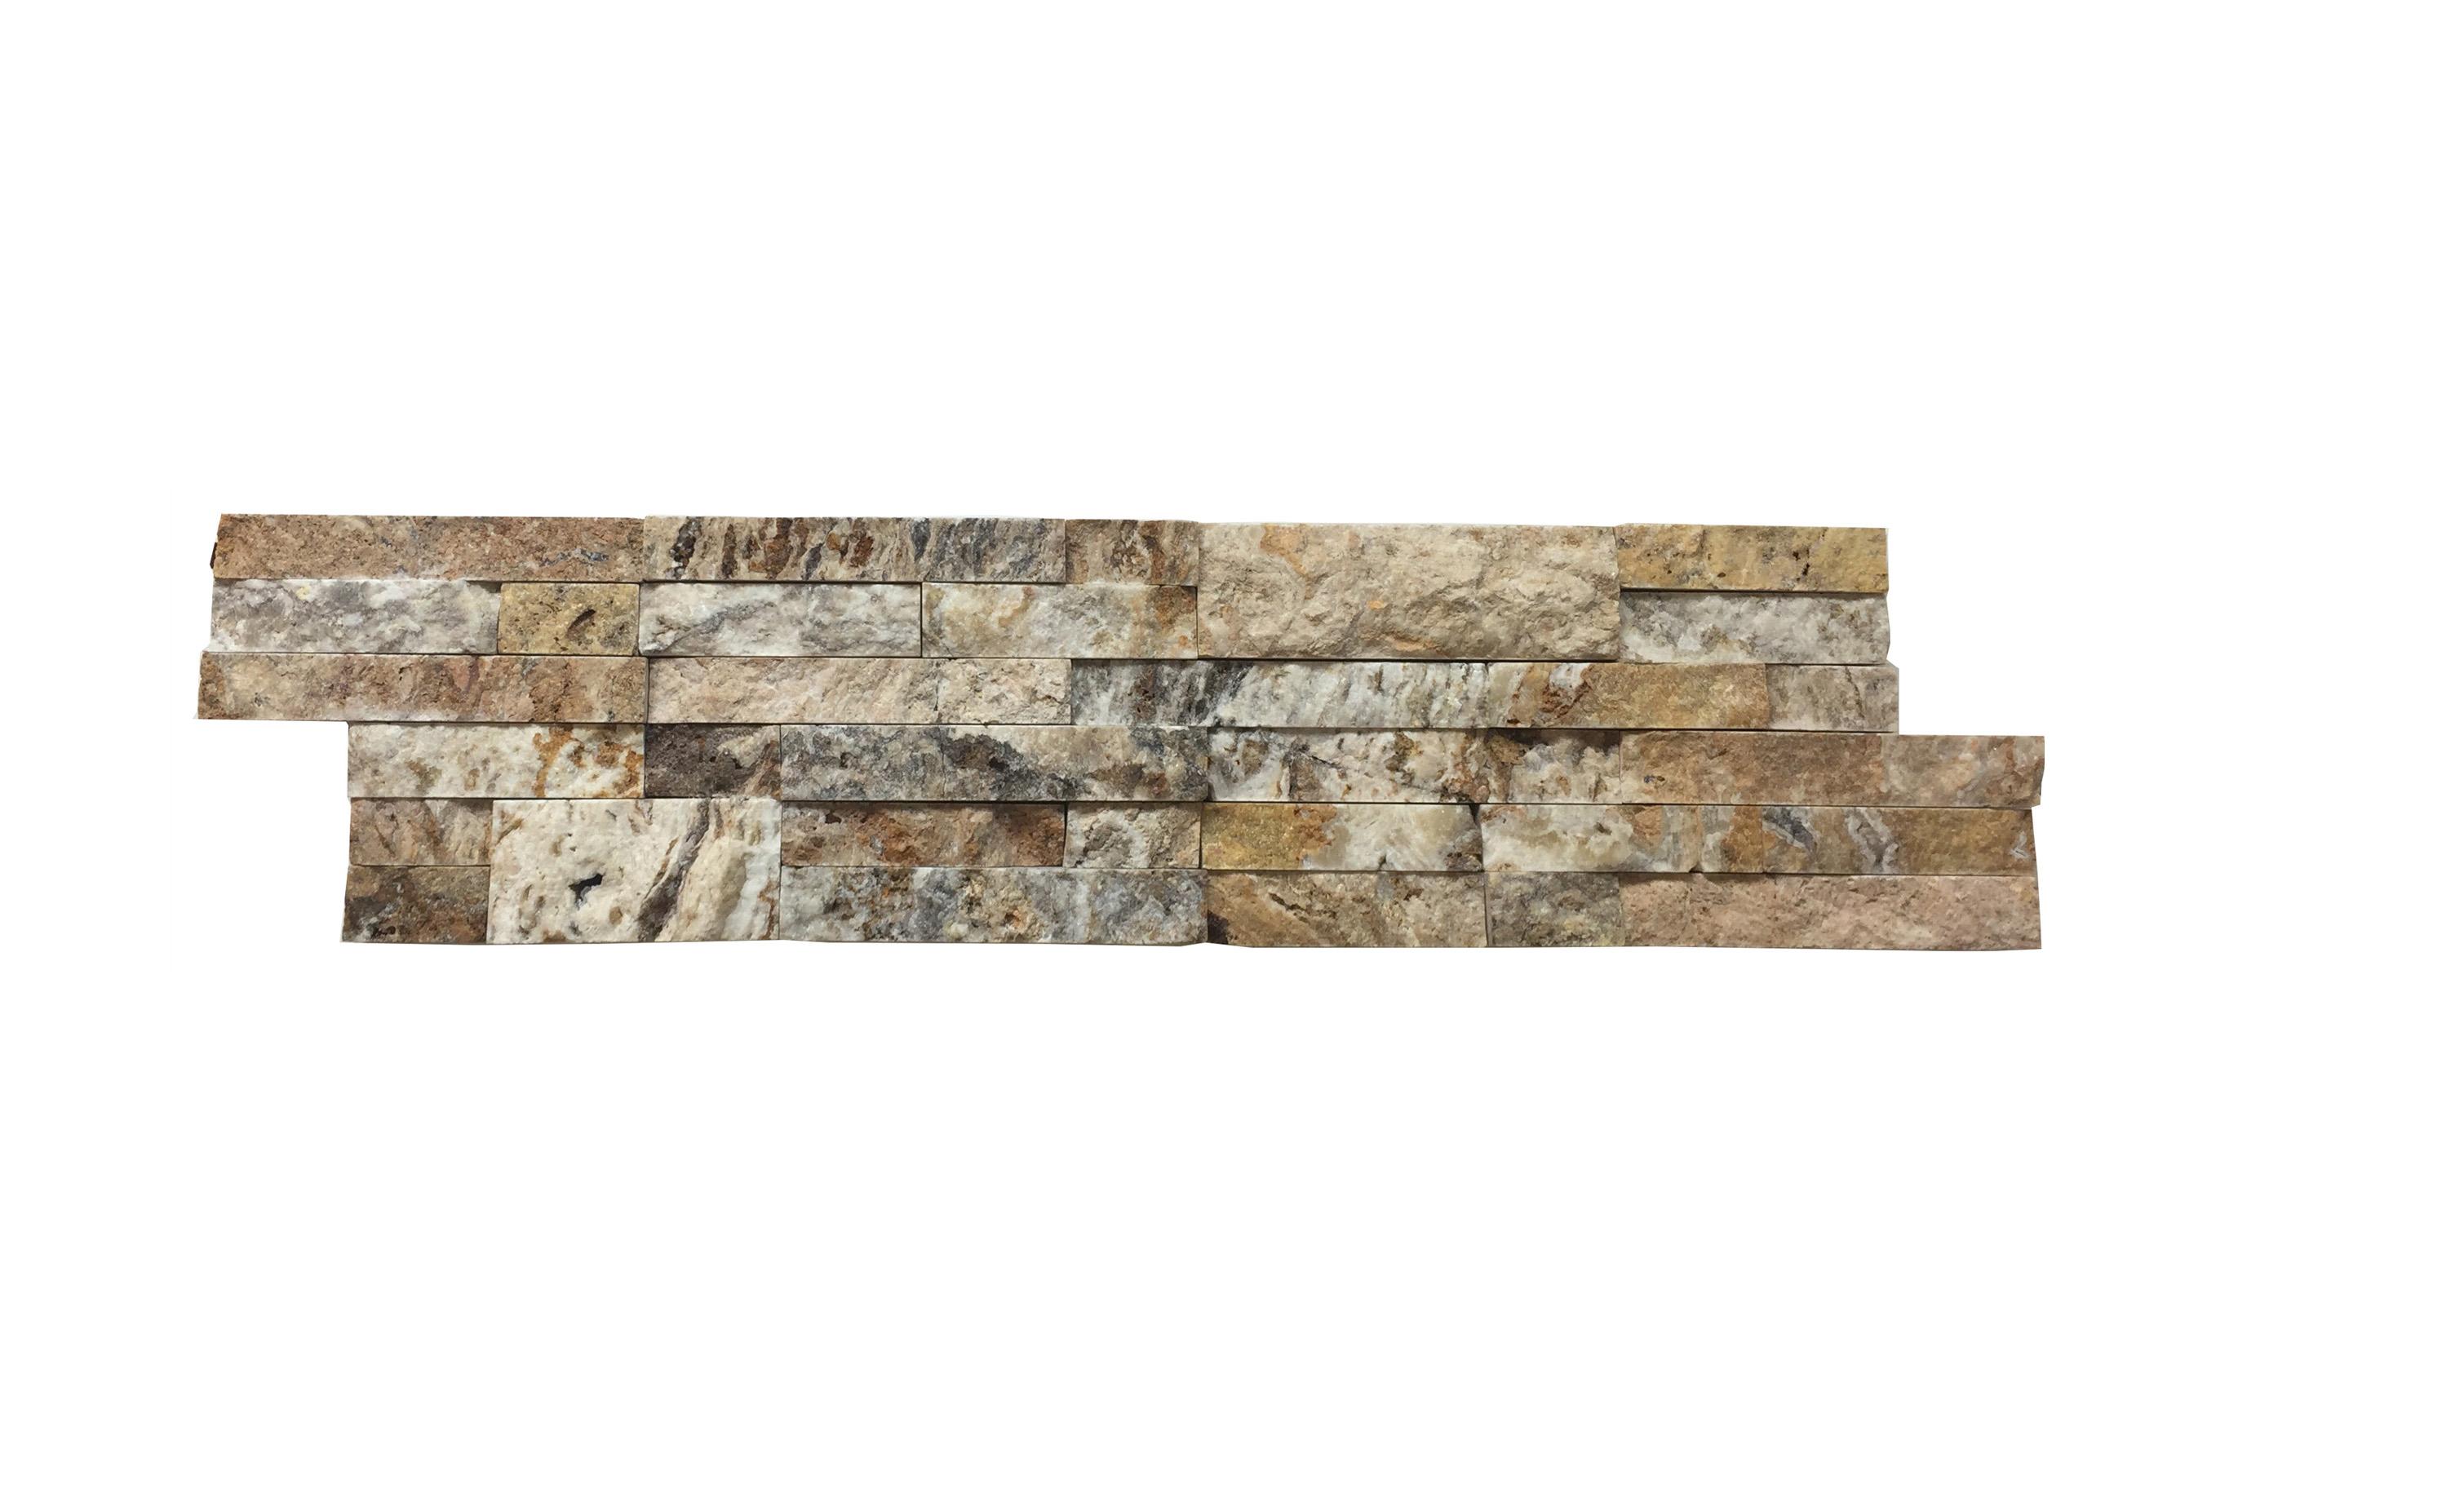 Tiger Skin Linear Split Face Travertine Mosaic Tiles 6x24